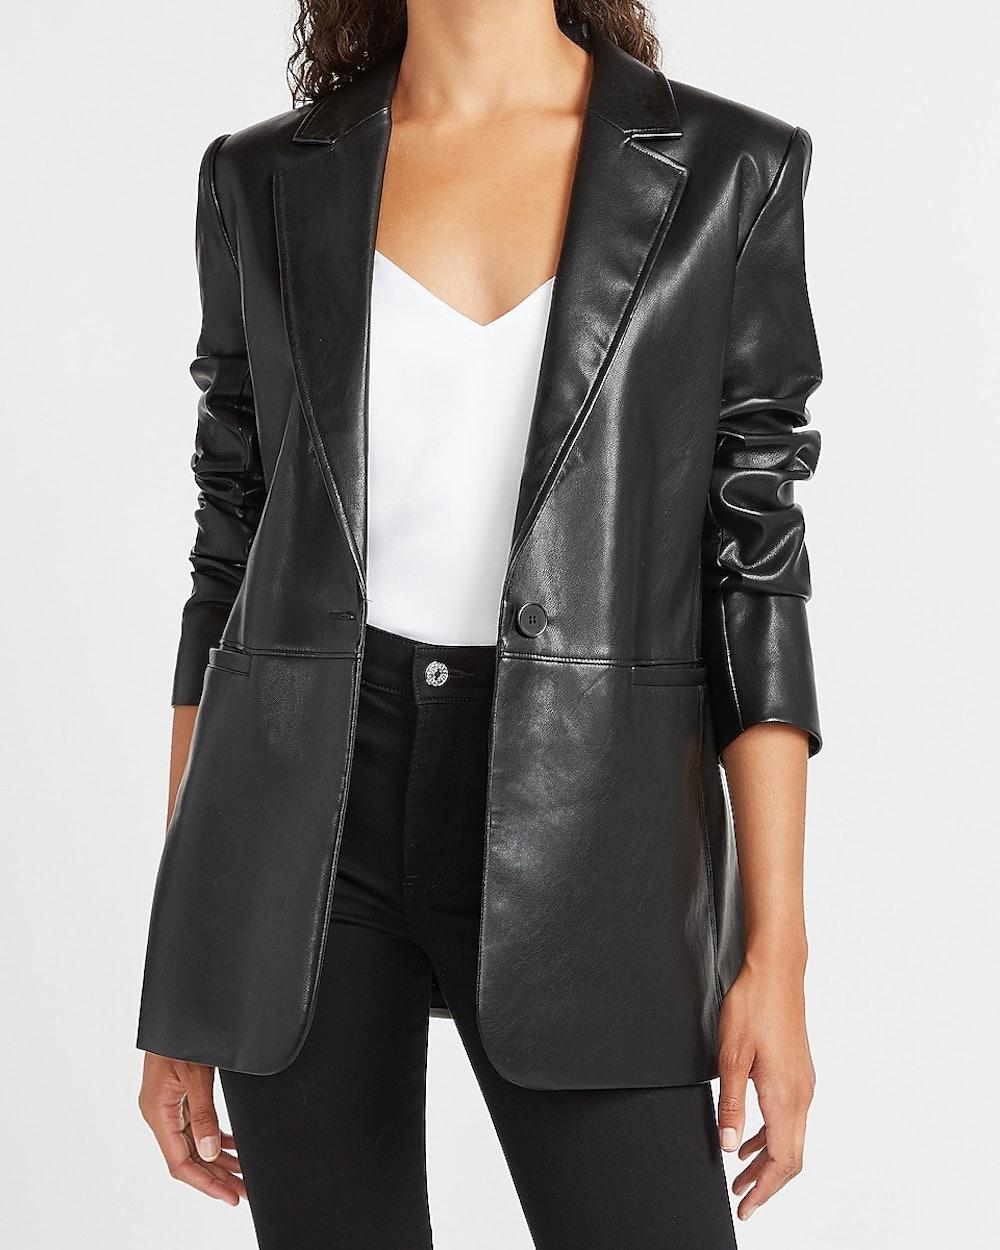 Vegan Leather One Button Long Sleeve Blazer